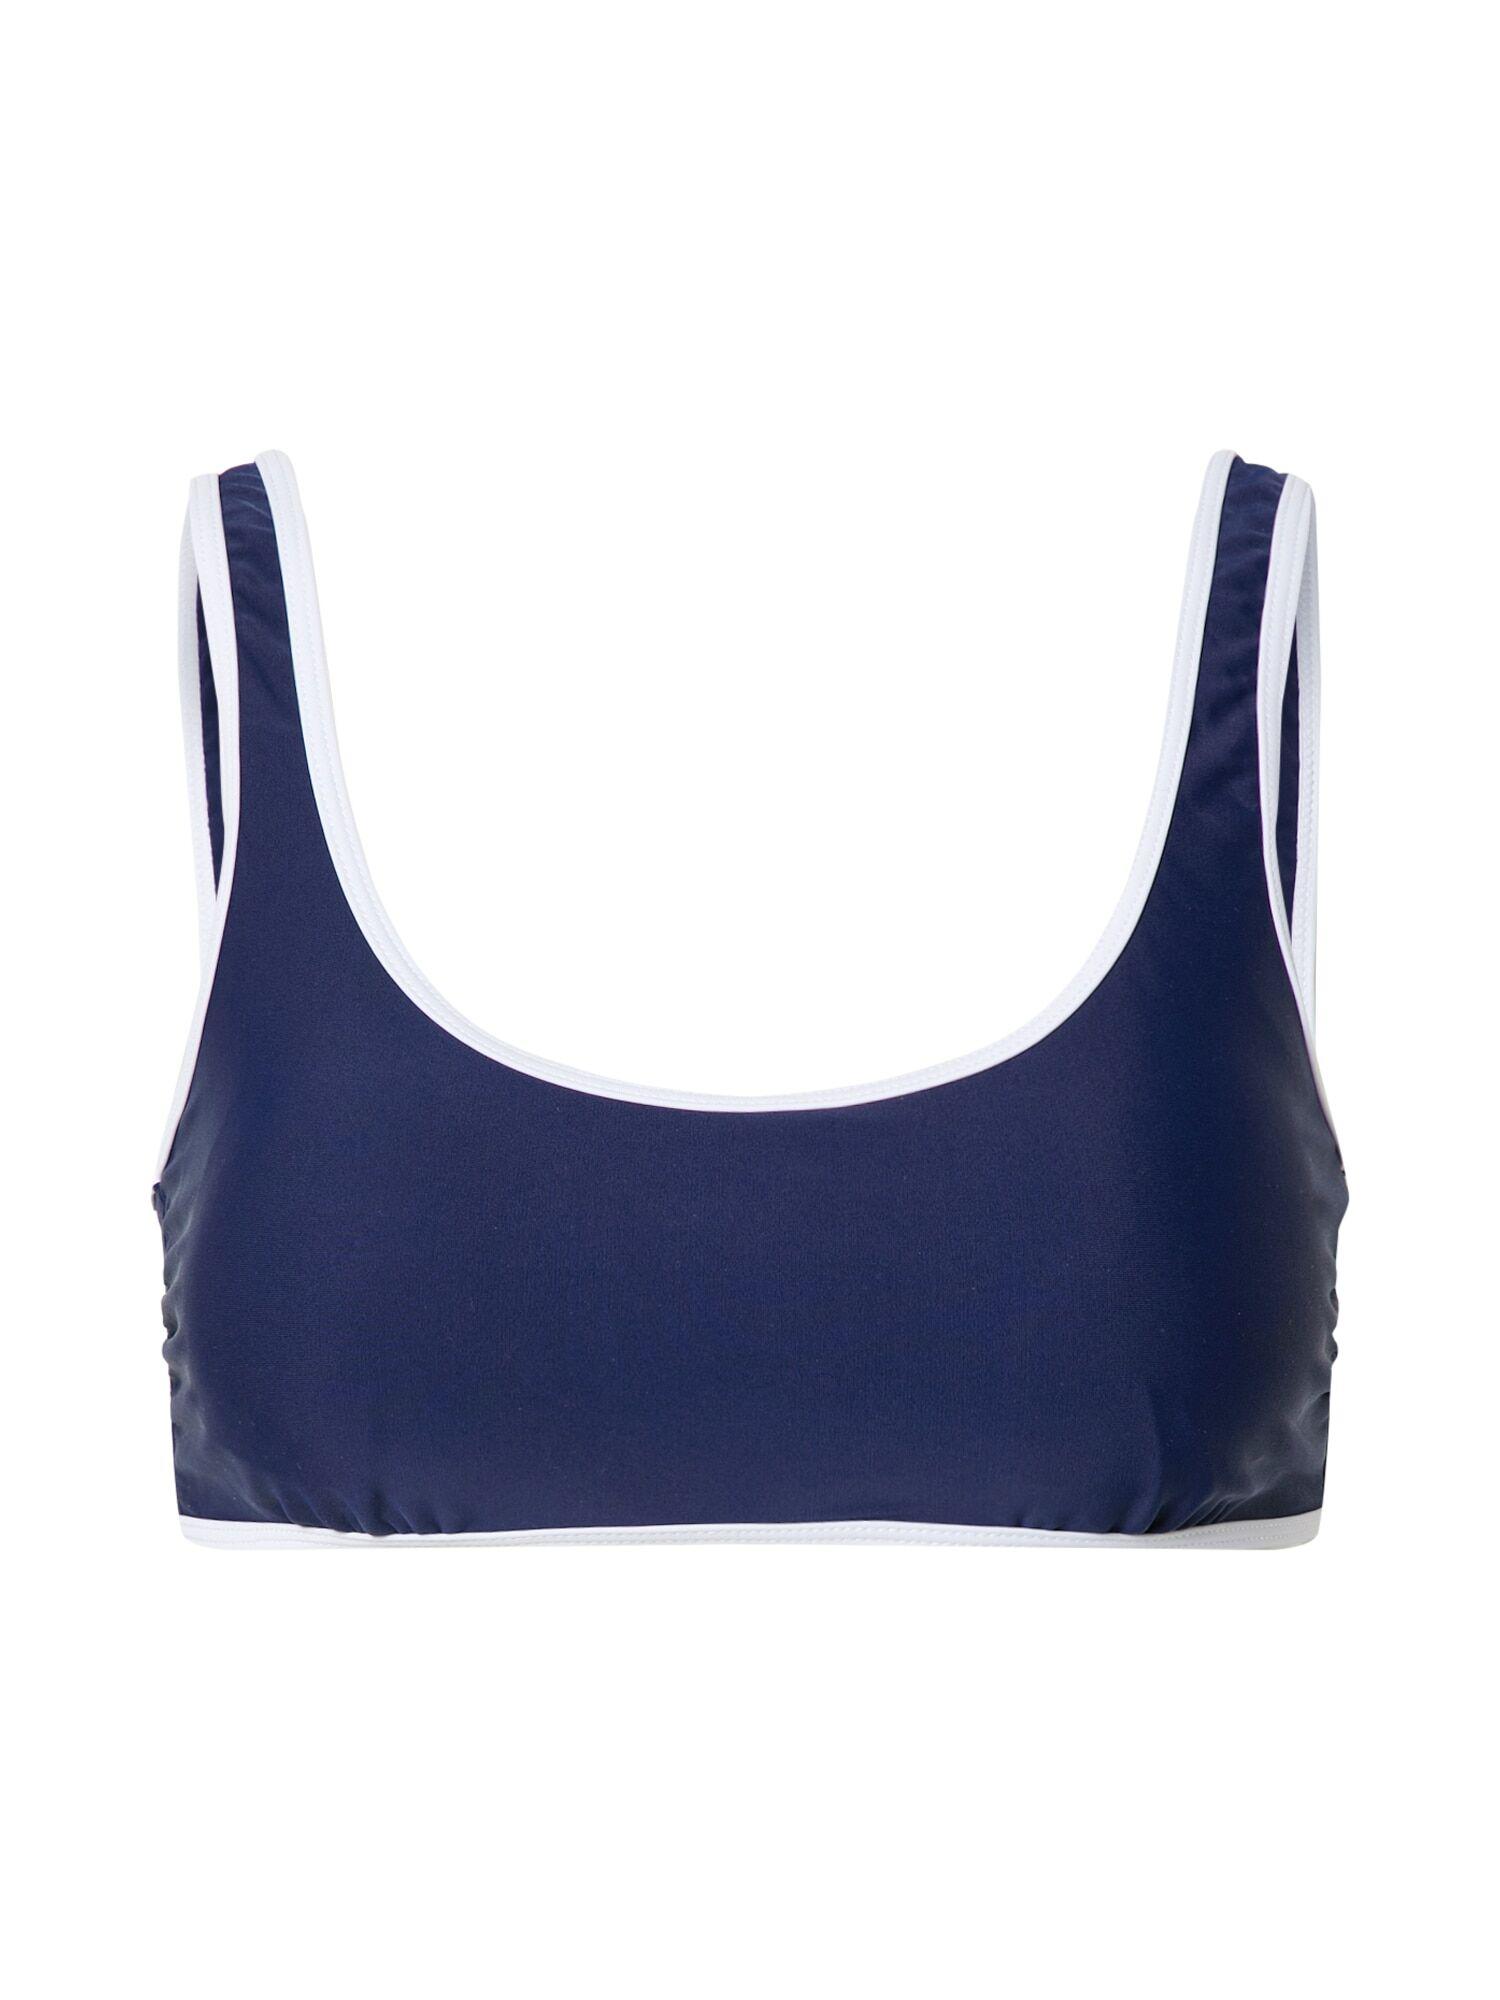 VENICE BEACH Hauts de bikini  - Bleu - Taille: 38 - female